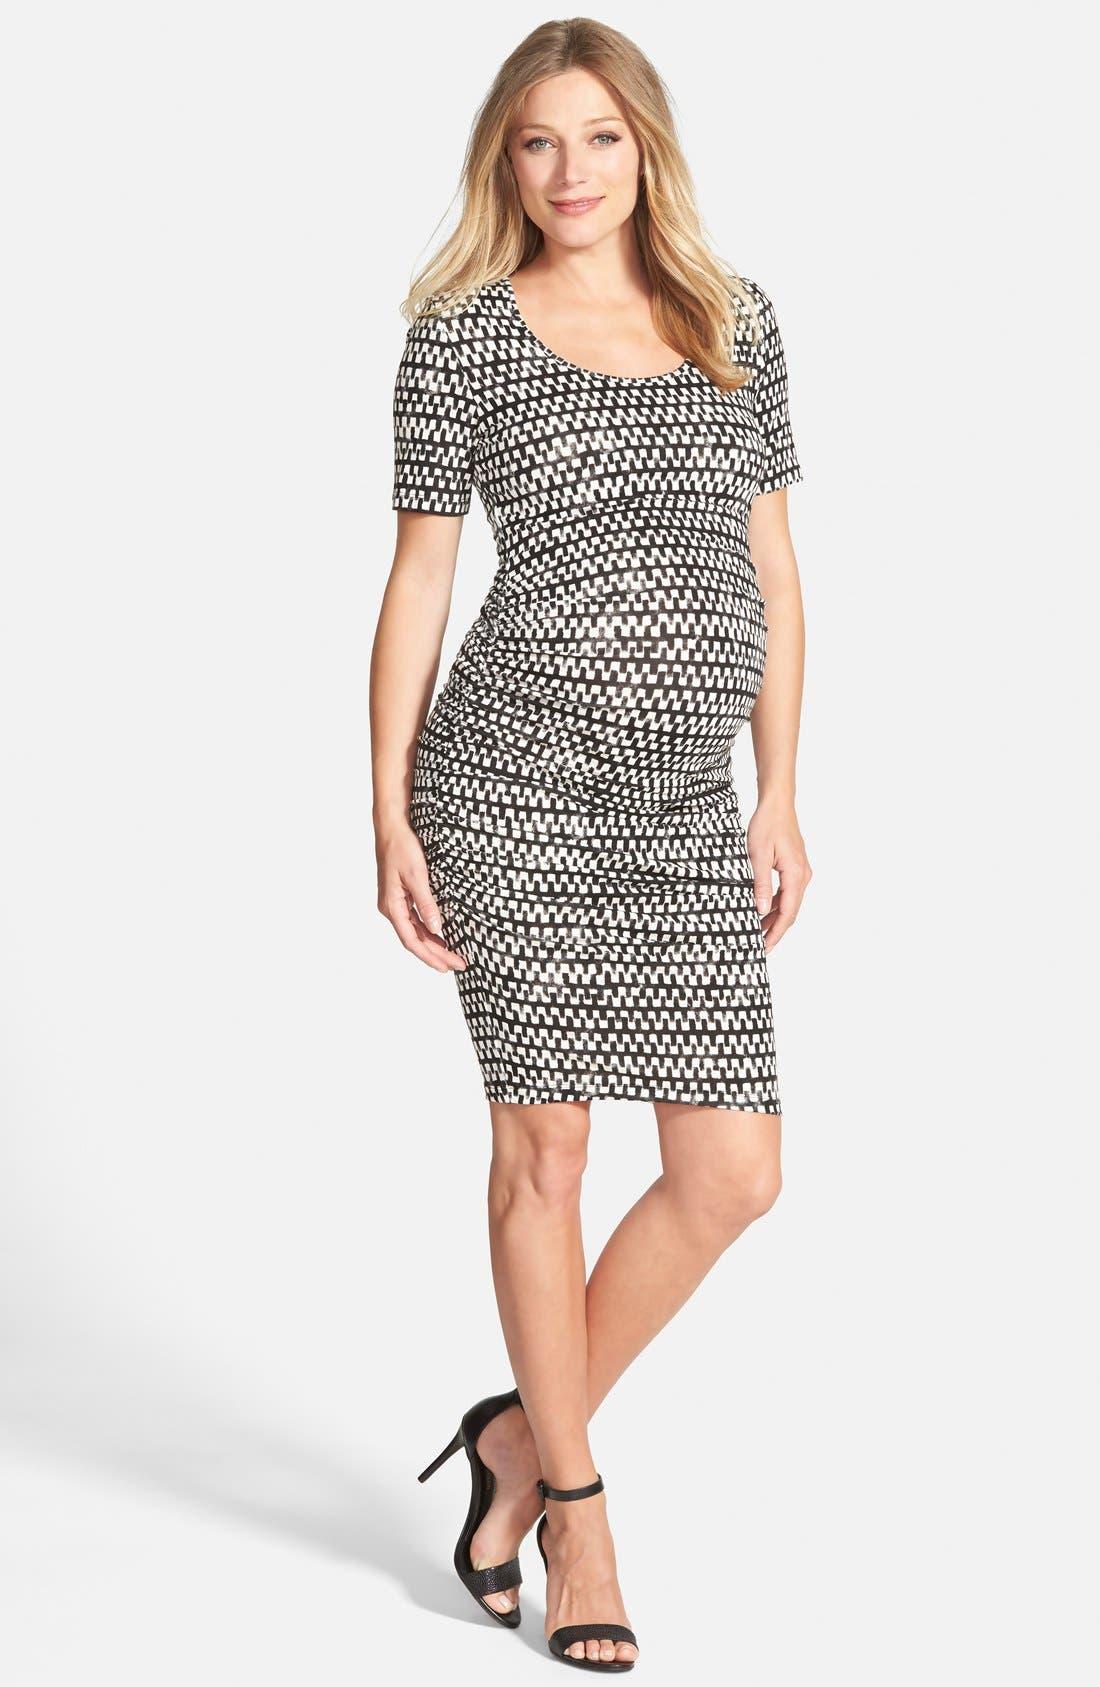 Main Image - Tart Maternity 'Bump' Midi Body-Con Maternity Dress